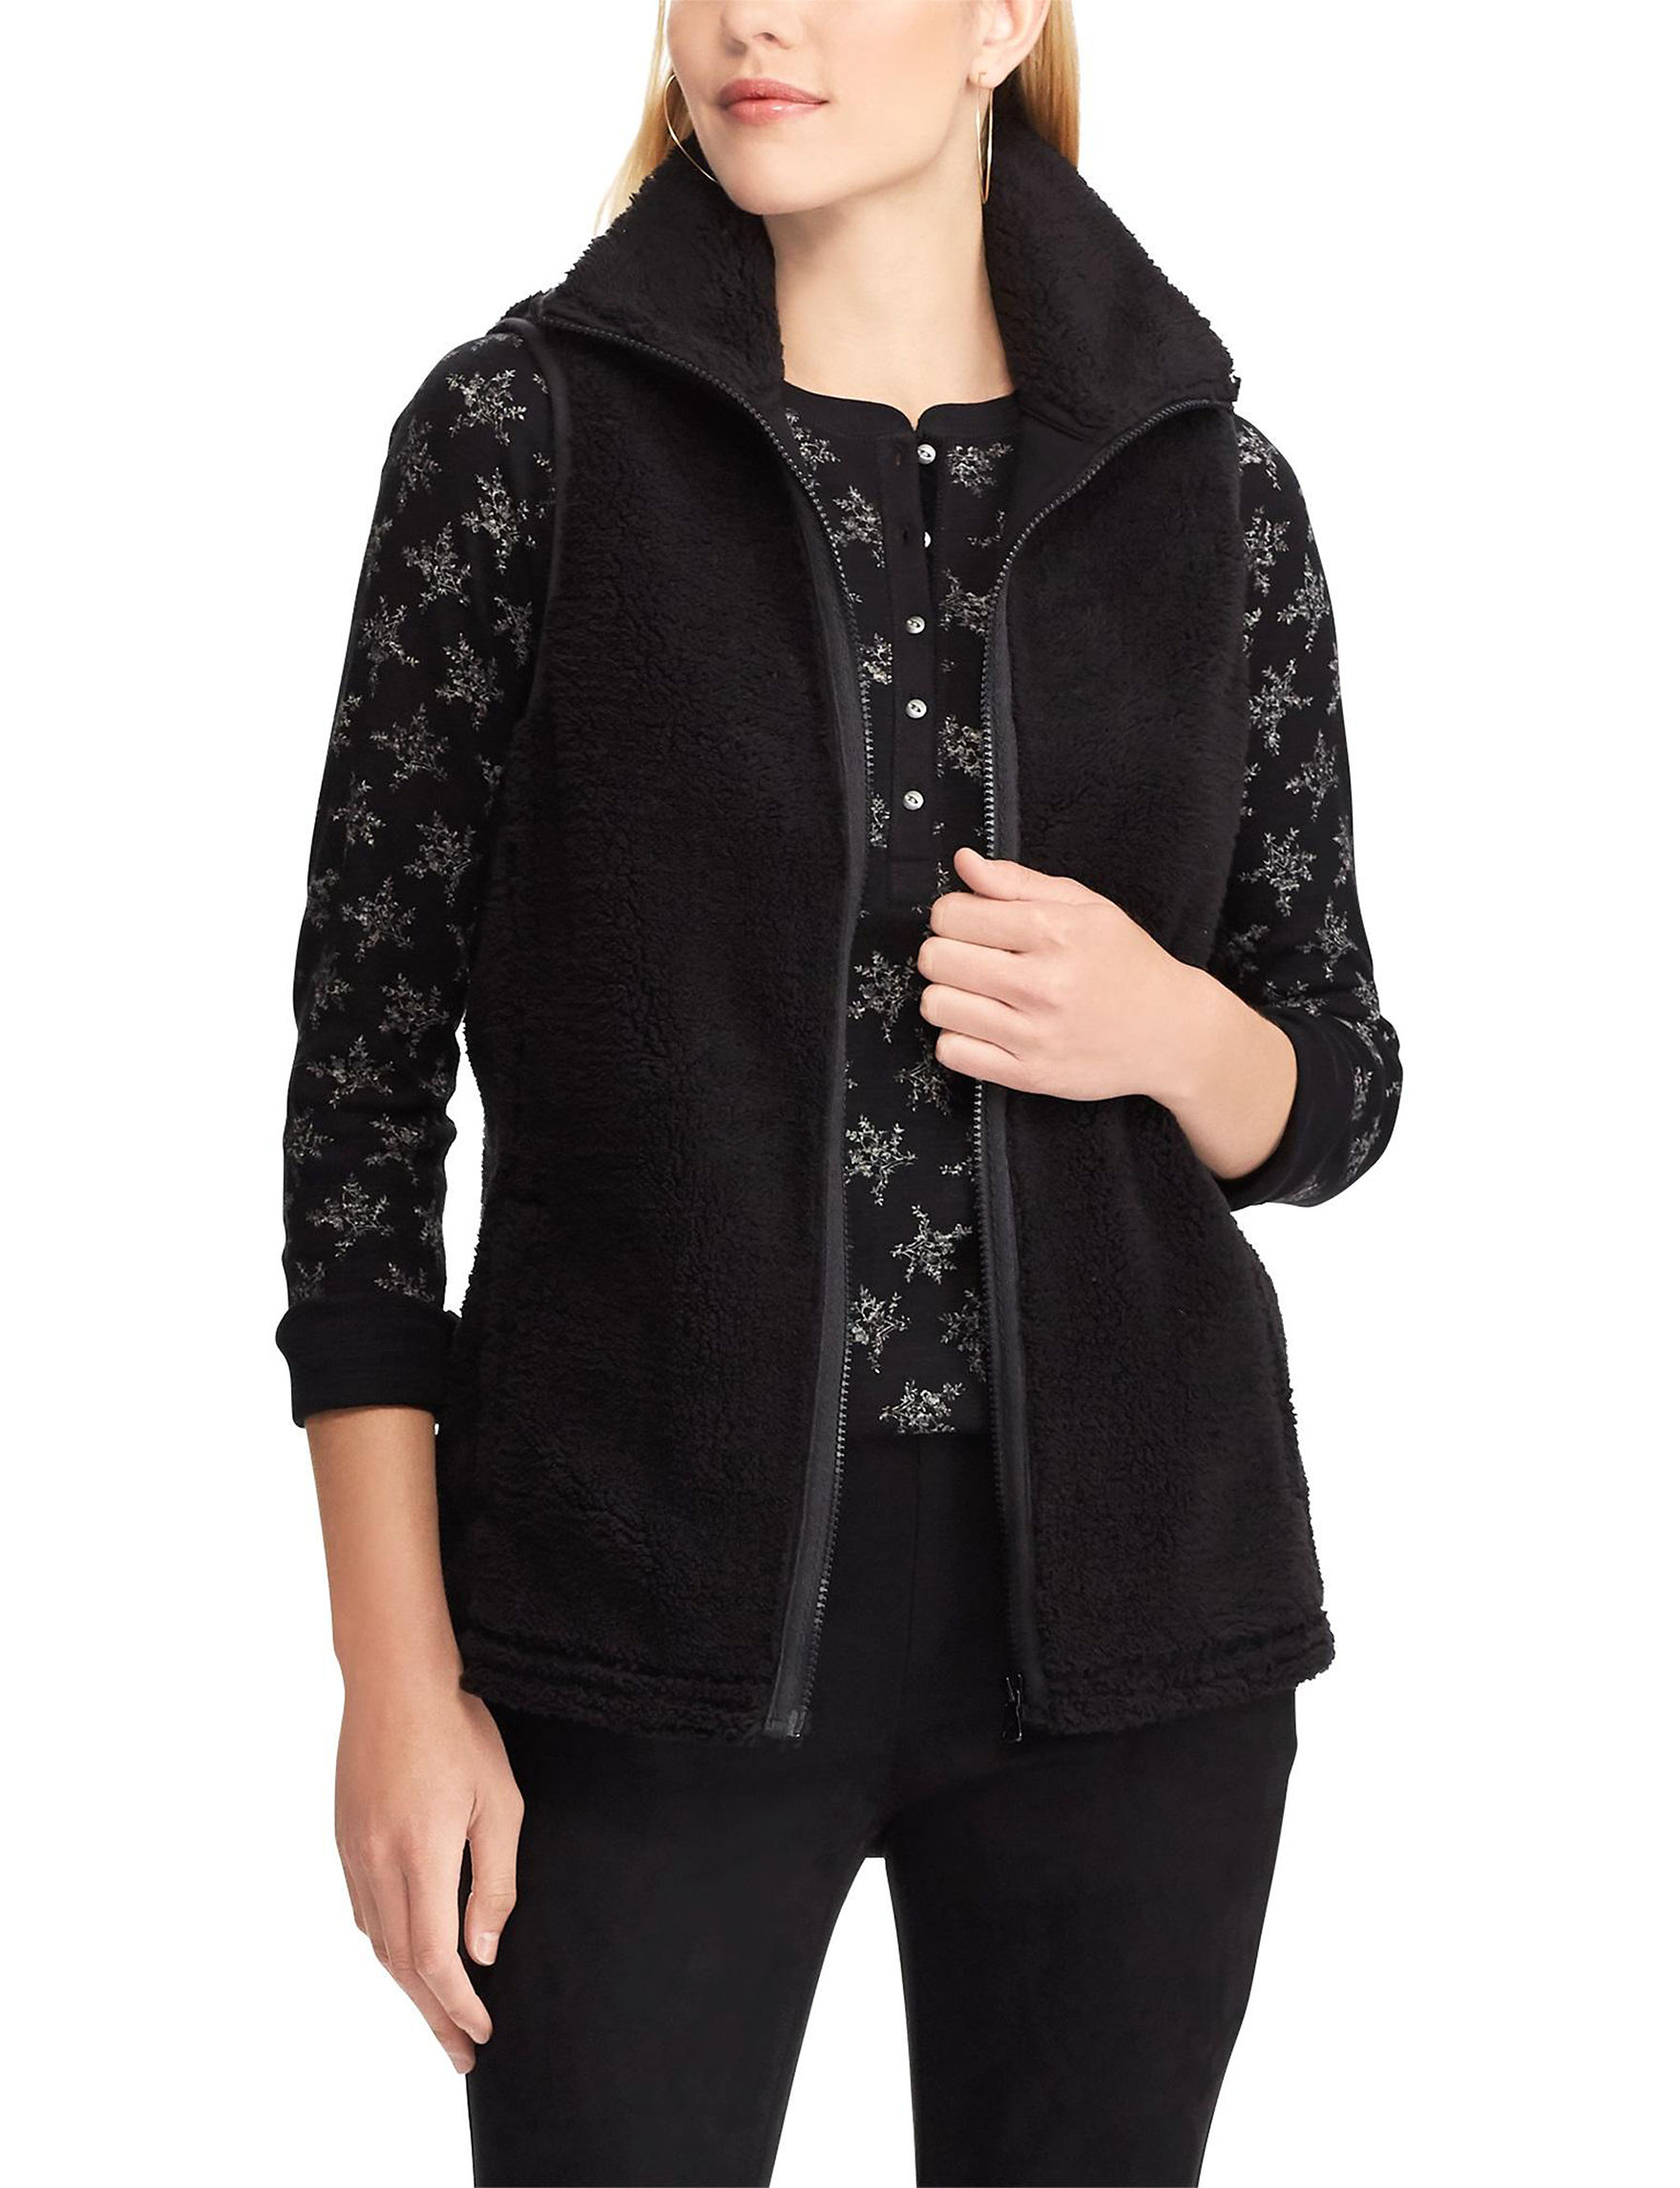 Chaps Black Sweater Vests